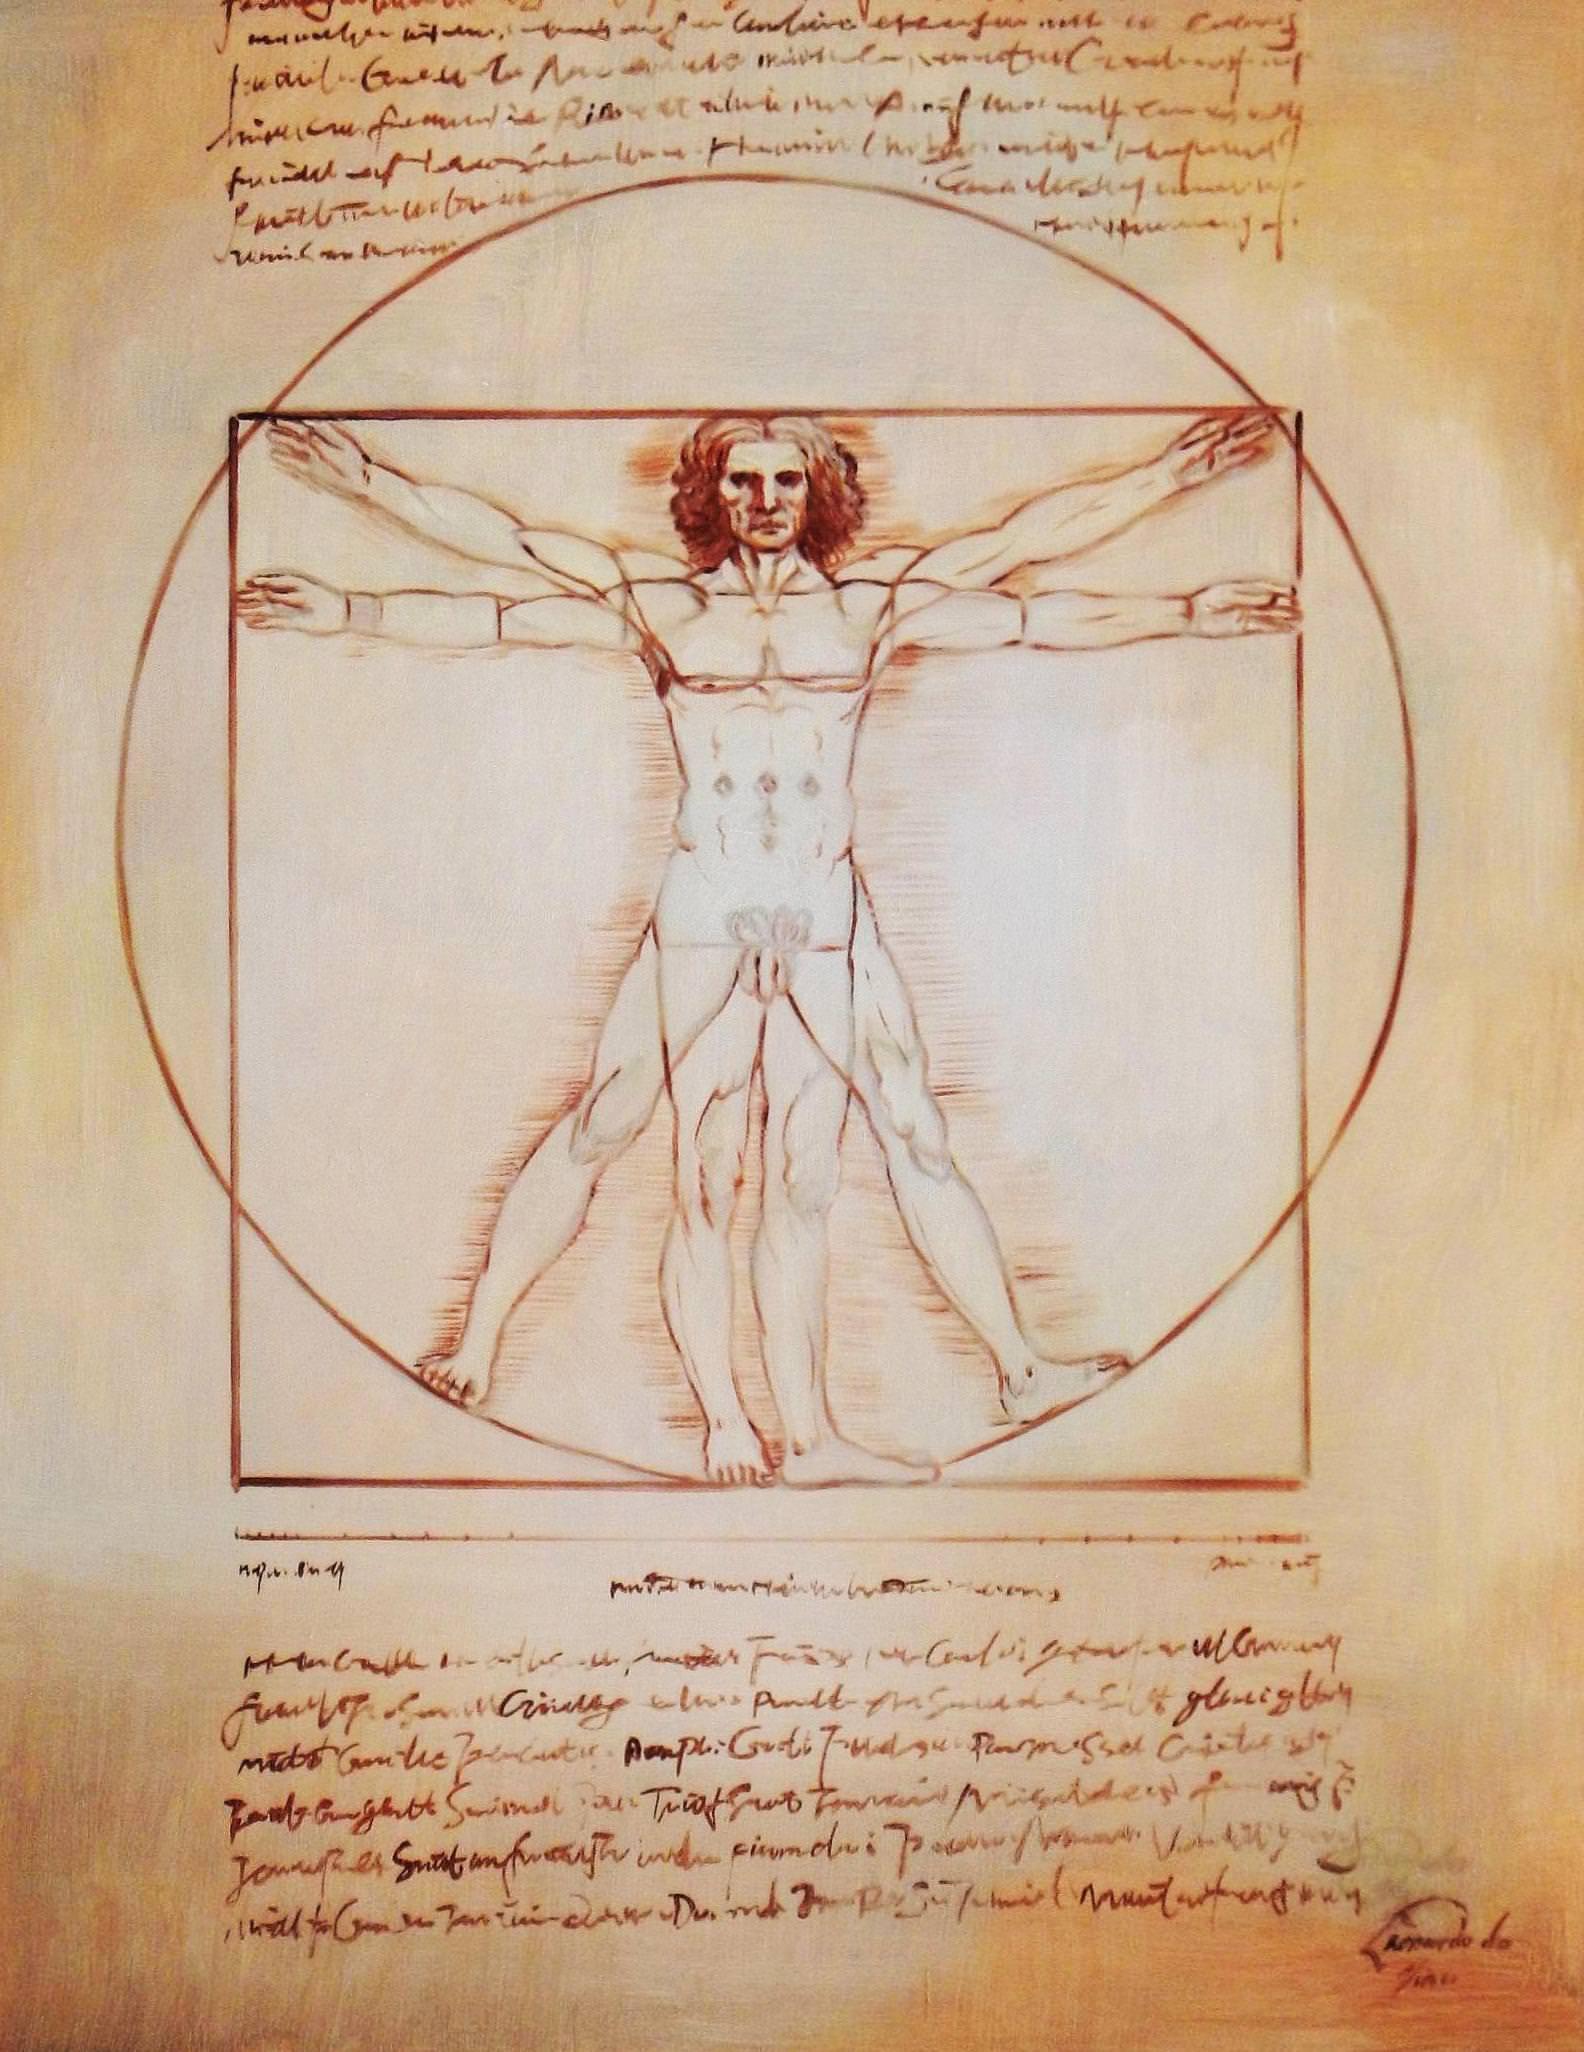 Leonardo da Vinci - Proportionsstudie c93887 50x60cm handgemaltes Ölgemälde